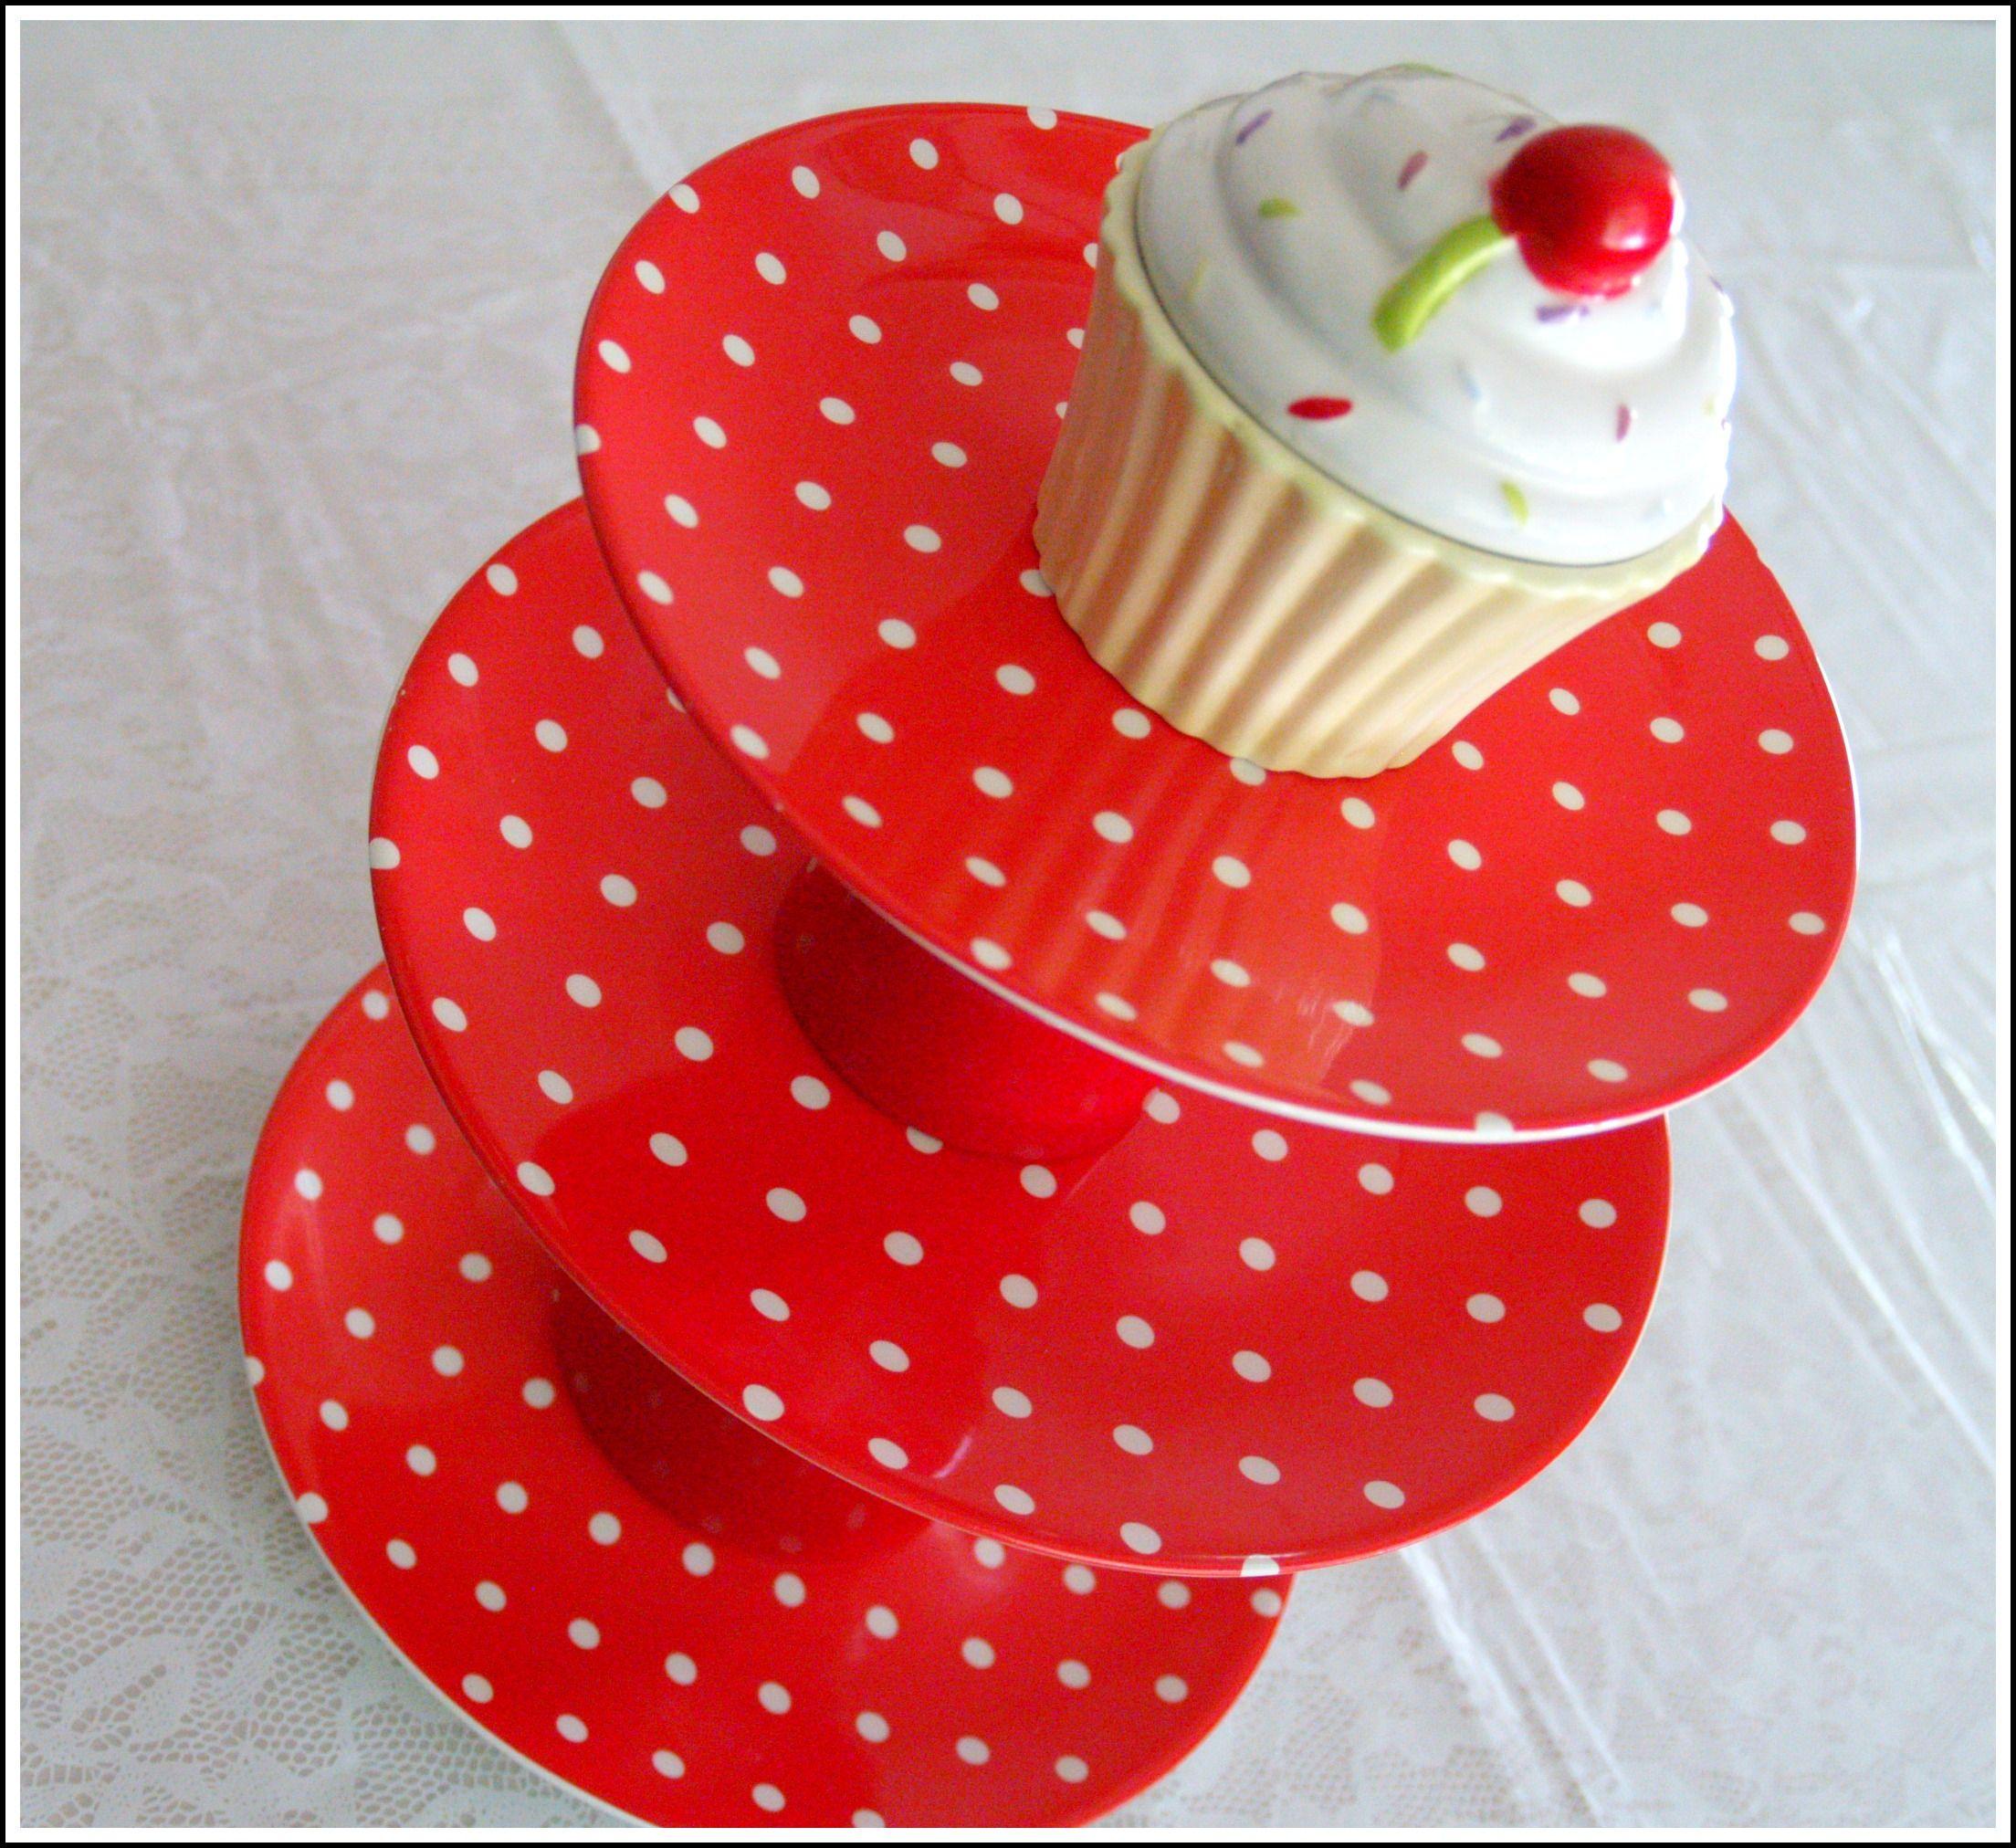 Cupcake Stand Using E6000 Glue 2 Large Dinner Plates 1 Small Appetizer Plate 1 Large 1 Small Flower Pot Blog 5 9 Frauenfruhstuck Deko